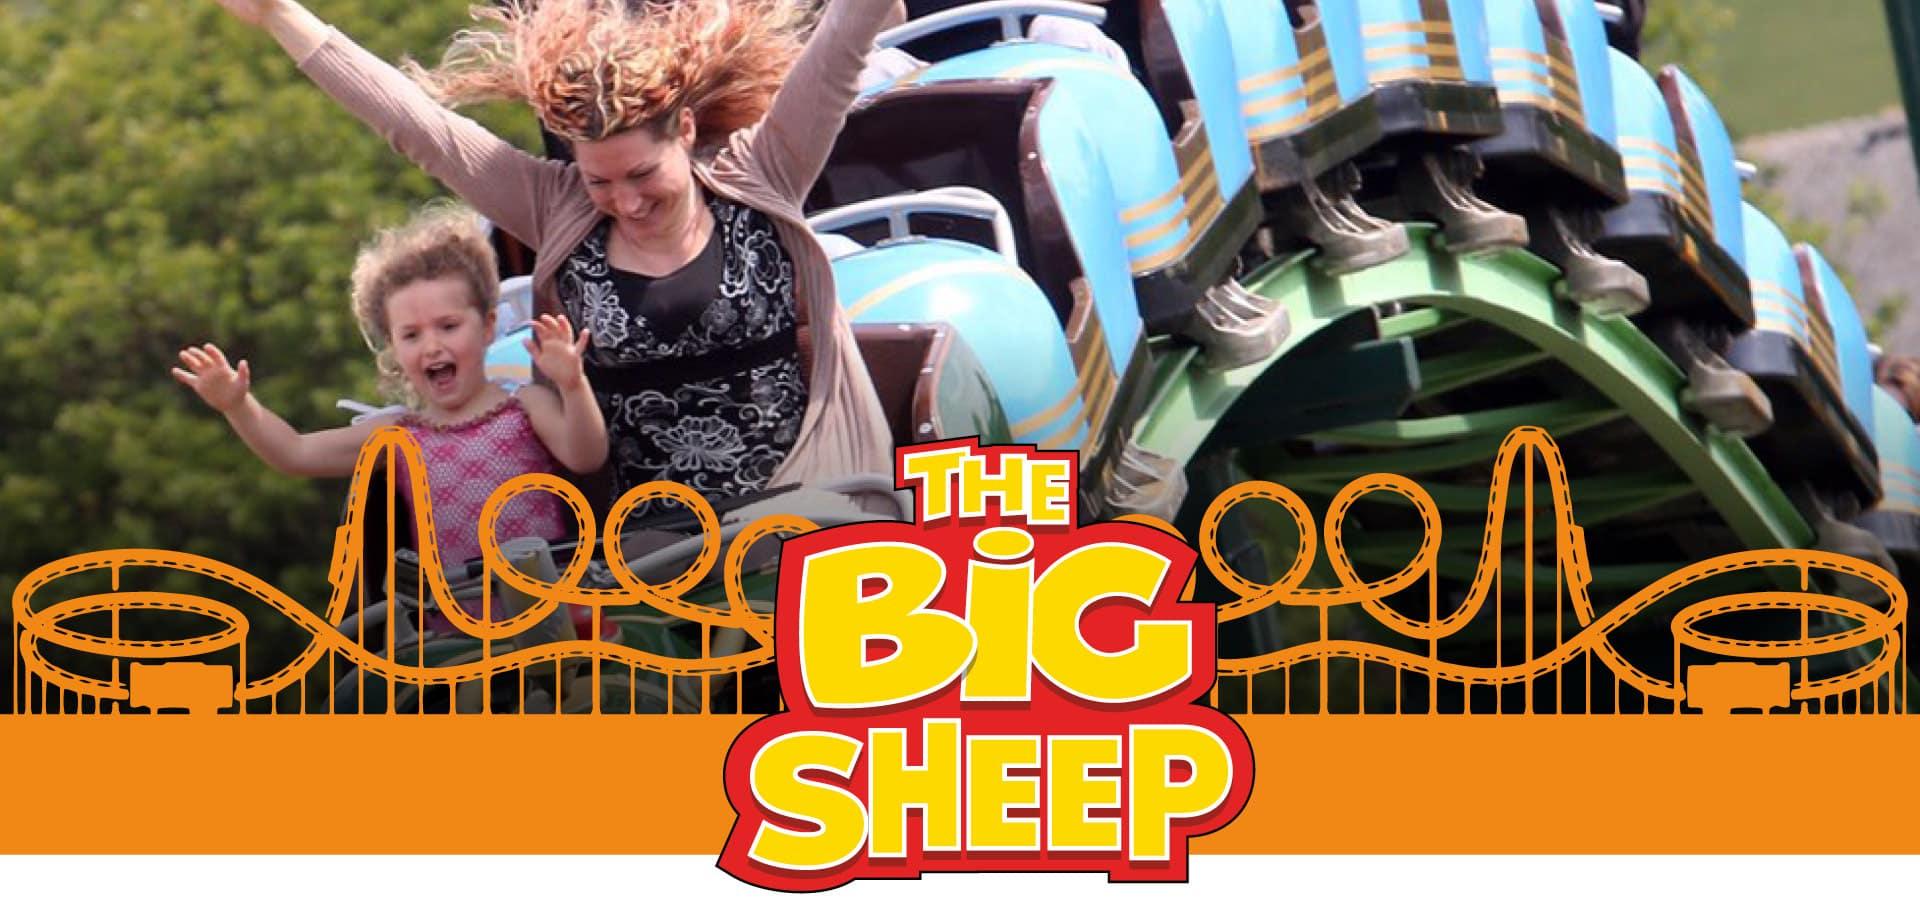 The Big Sheep Family Rides